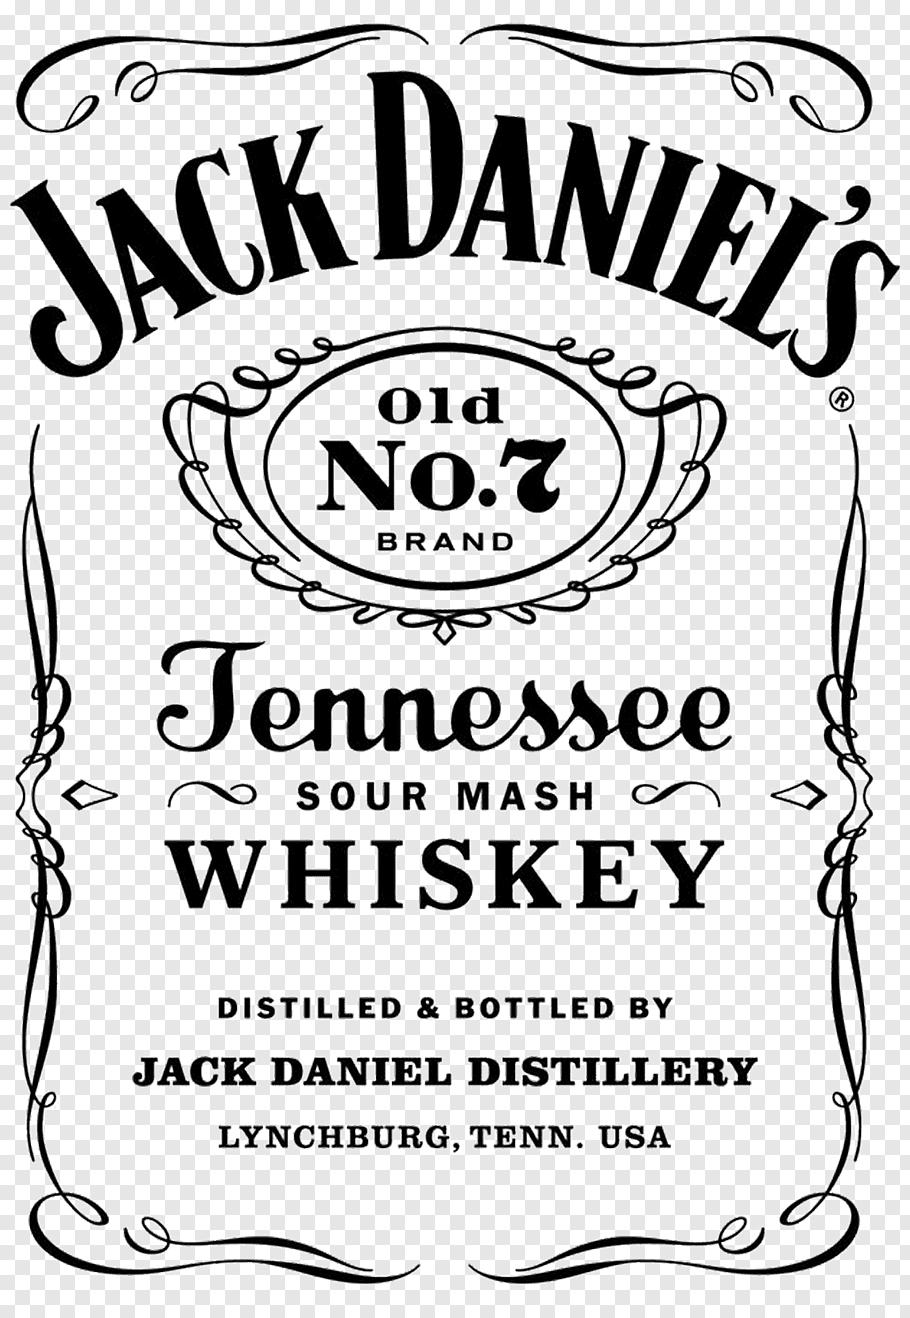 Jack Daniels Old No. 7 Jennessee Whiskey logo, Jack Daniel\'s.